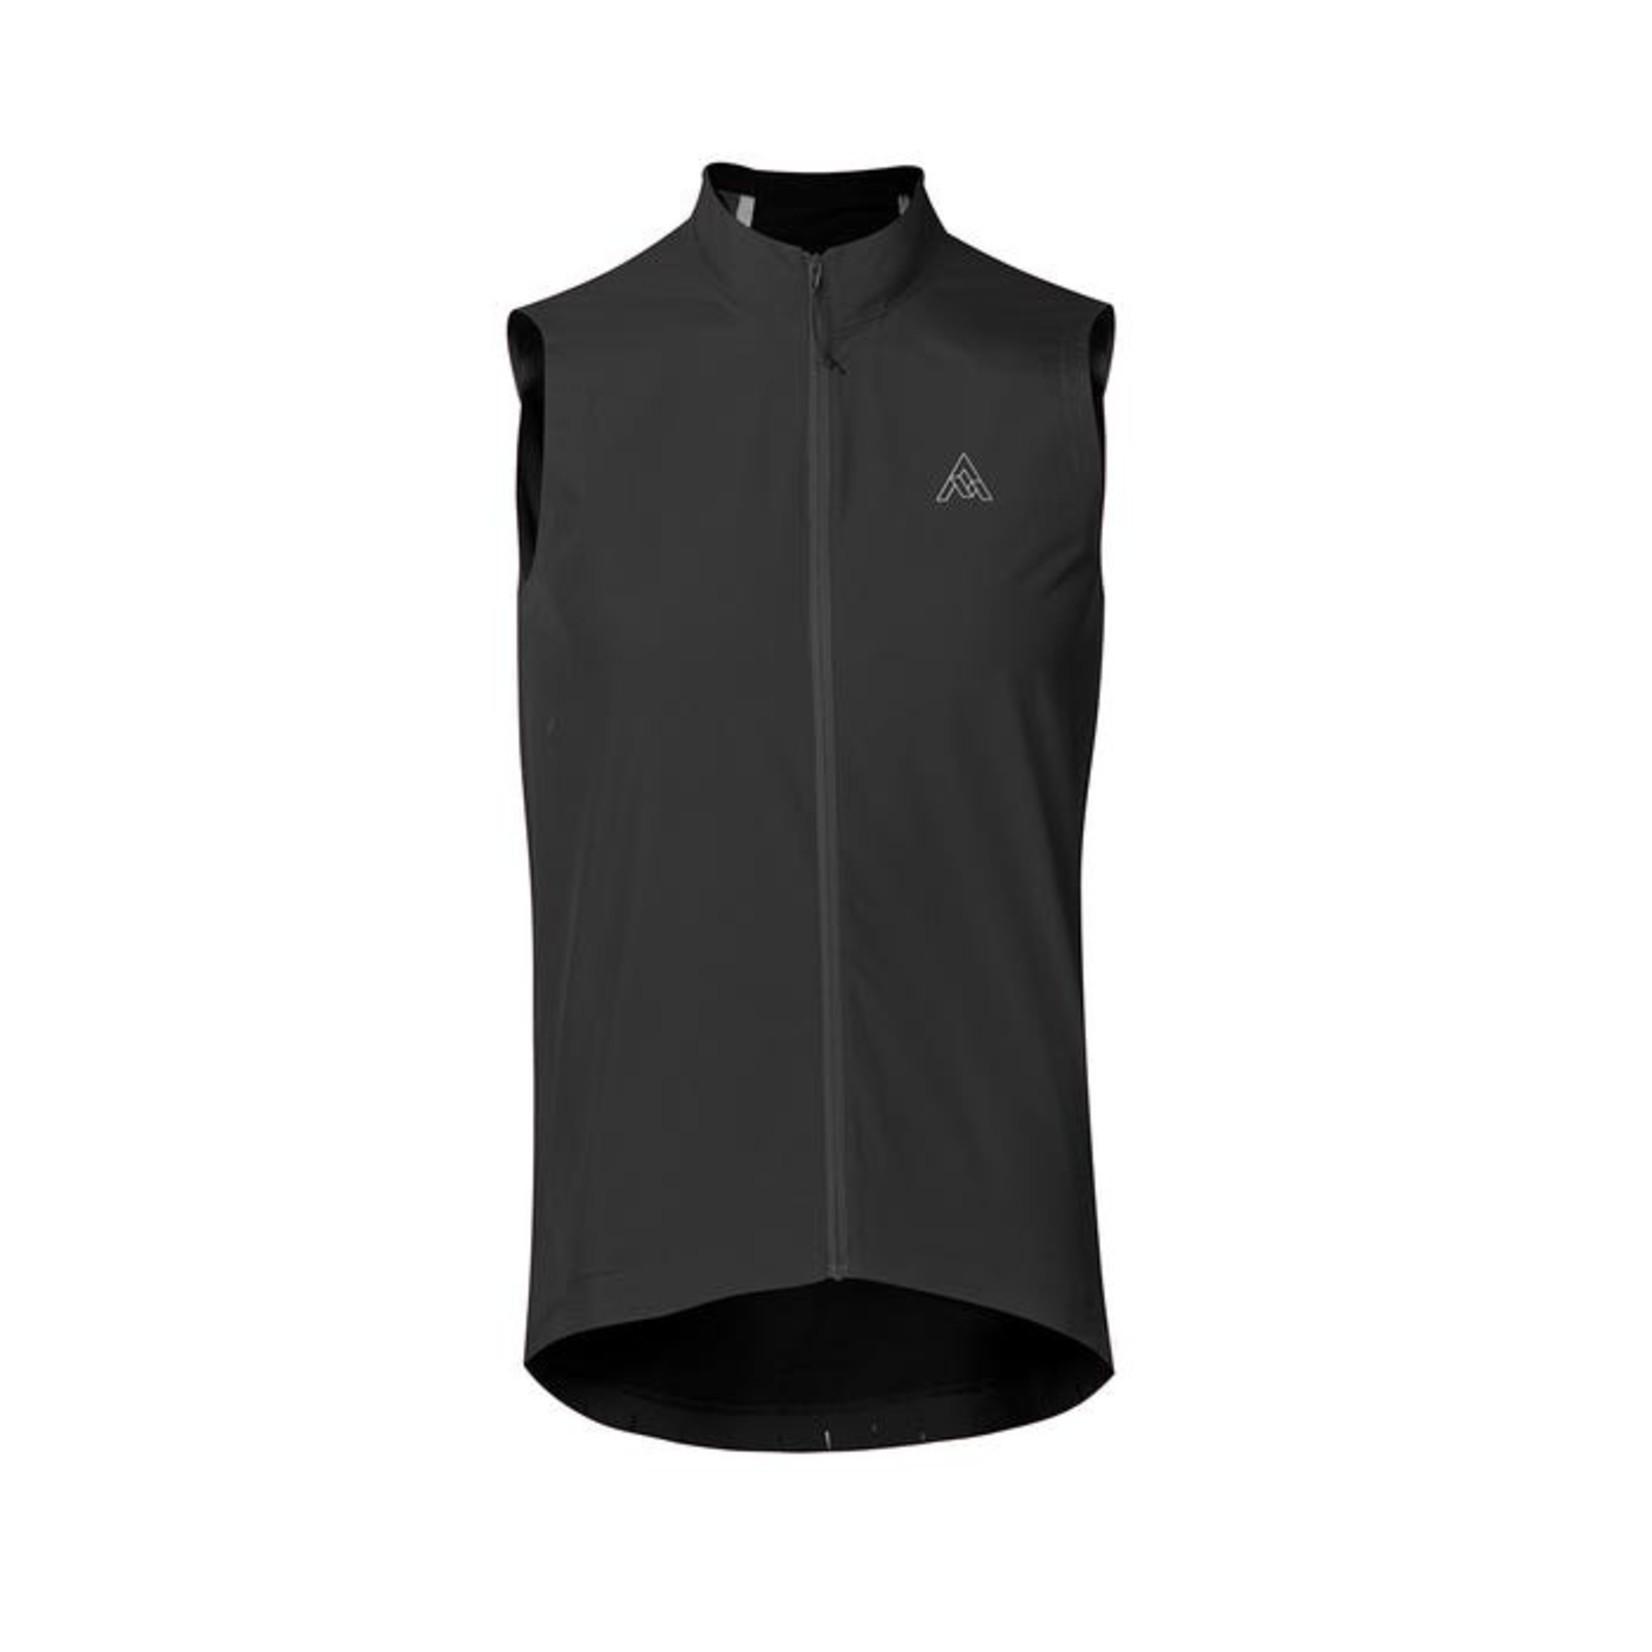 7Mesh 7Mesh Cypress Hybrid Vest Men's